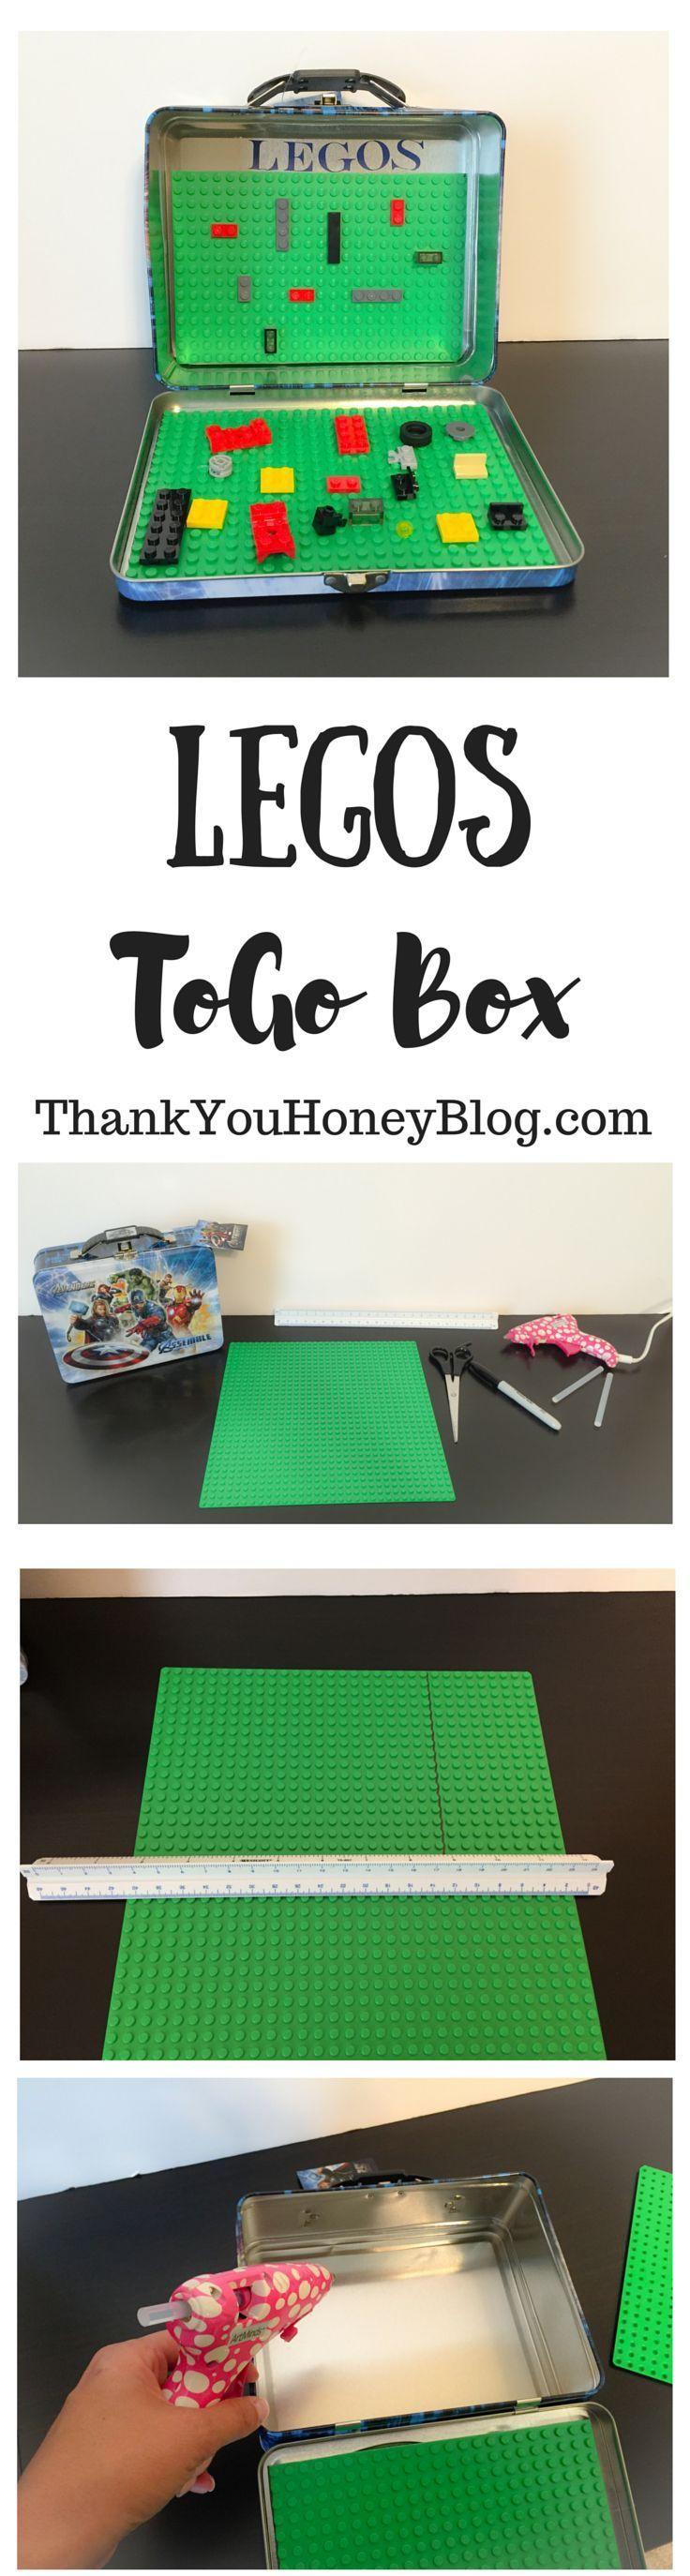 LEGOS ToGo Box, Travel LEGO Box, LEGOS, Travel, Kids, Kids Activities, ToGo Activities for Kids, Travel Activities for Kids, Traveling with kids, Travel Activities, DIY, Tutorial, How To, Hack, http://thankyouhoneyblog.com